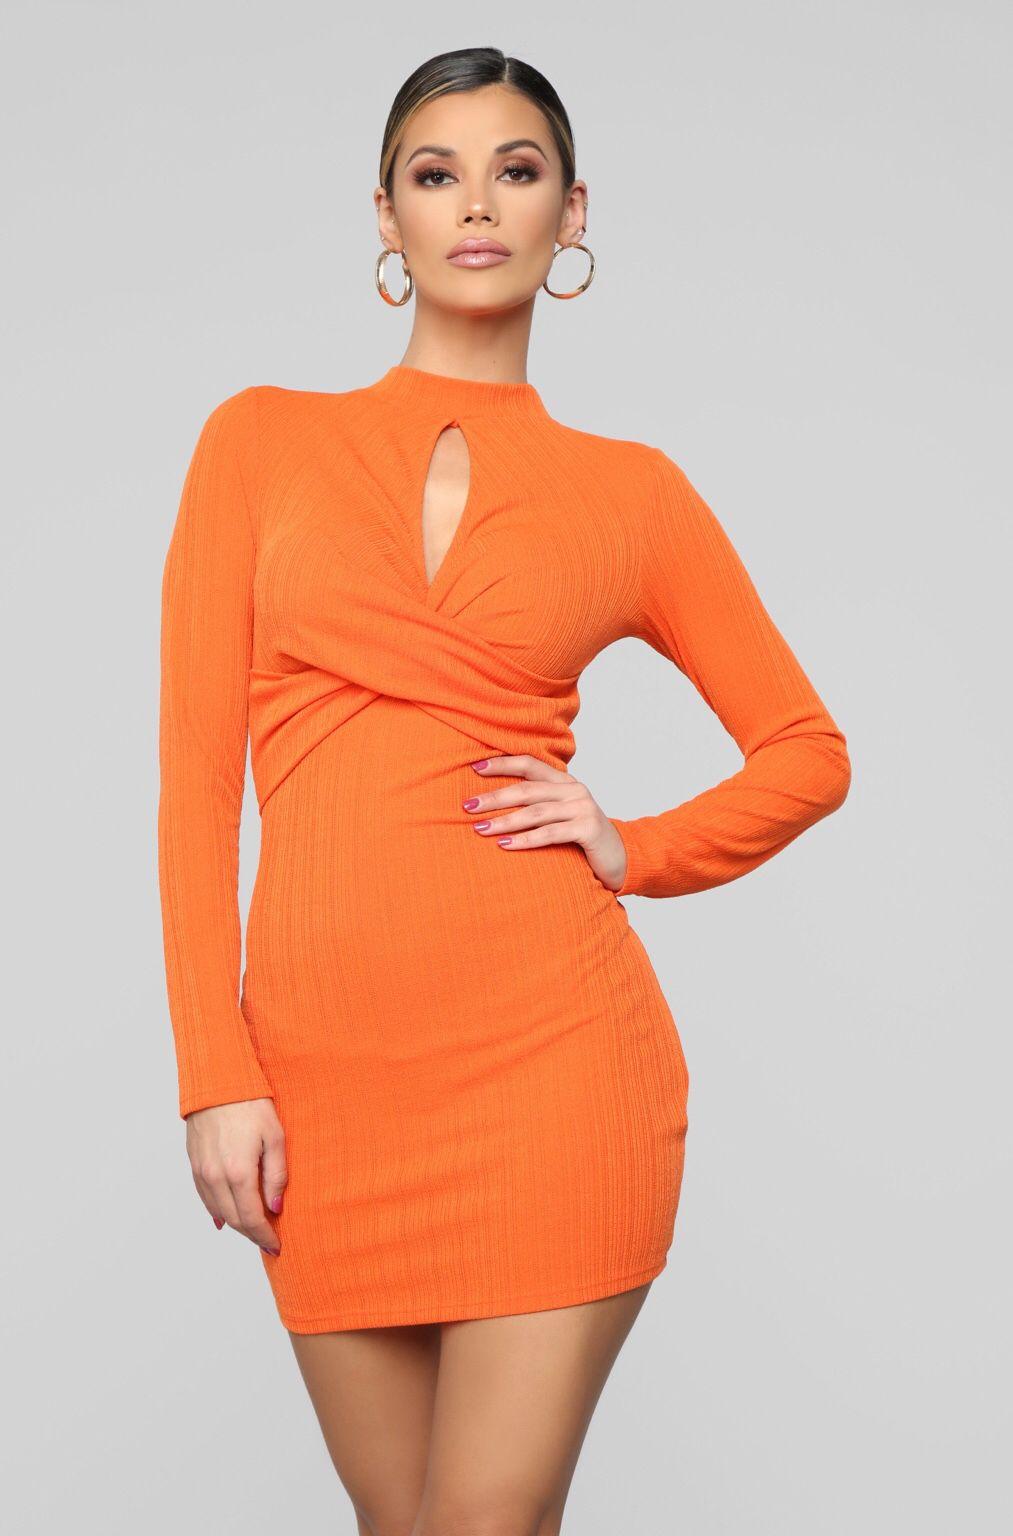 Touches My Soul Sweater Mini Dress Orange Mini Dress Mini Sweater Dress Fashion [ 1536 x 1013 Pixel ]